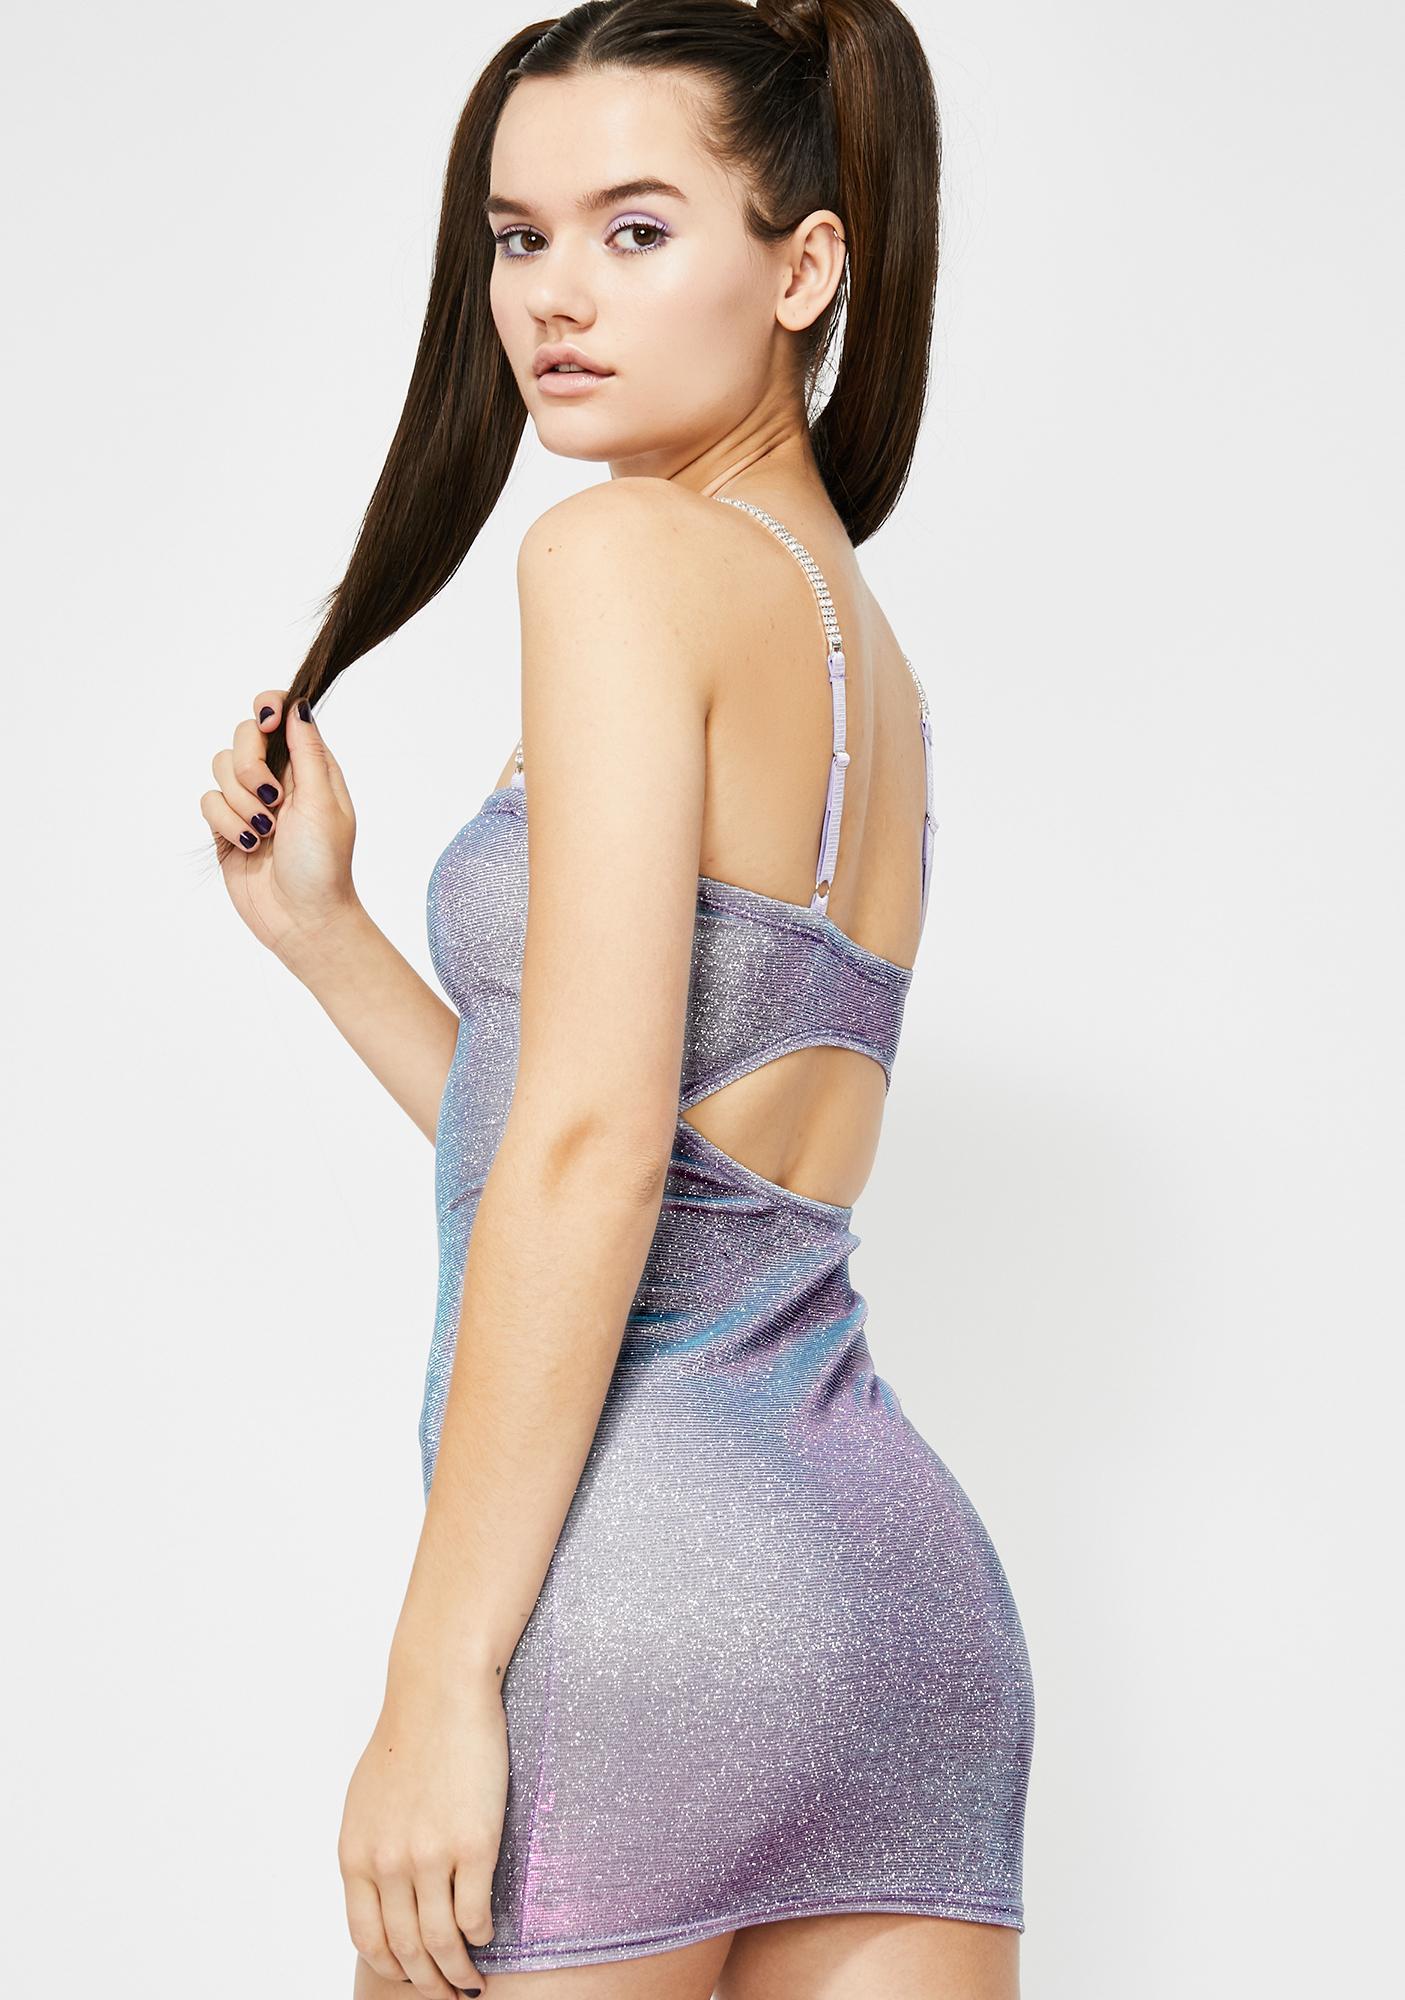 HOROSCOPEZ Trance Melody Sparkle Dress